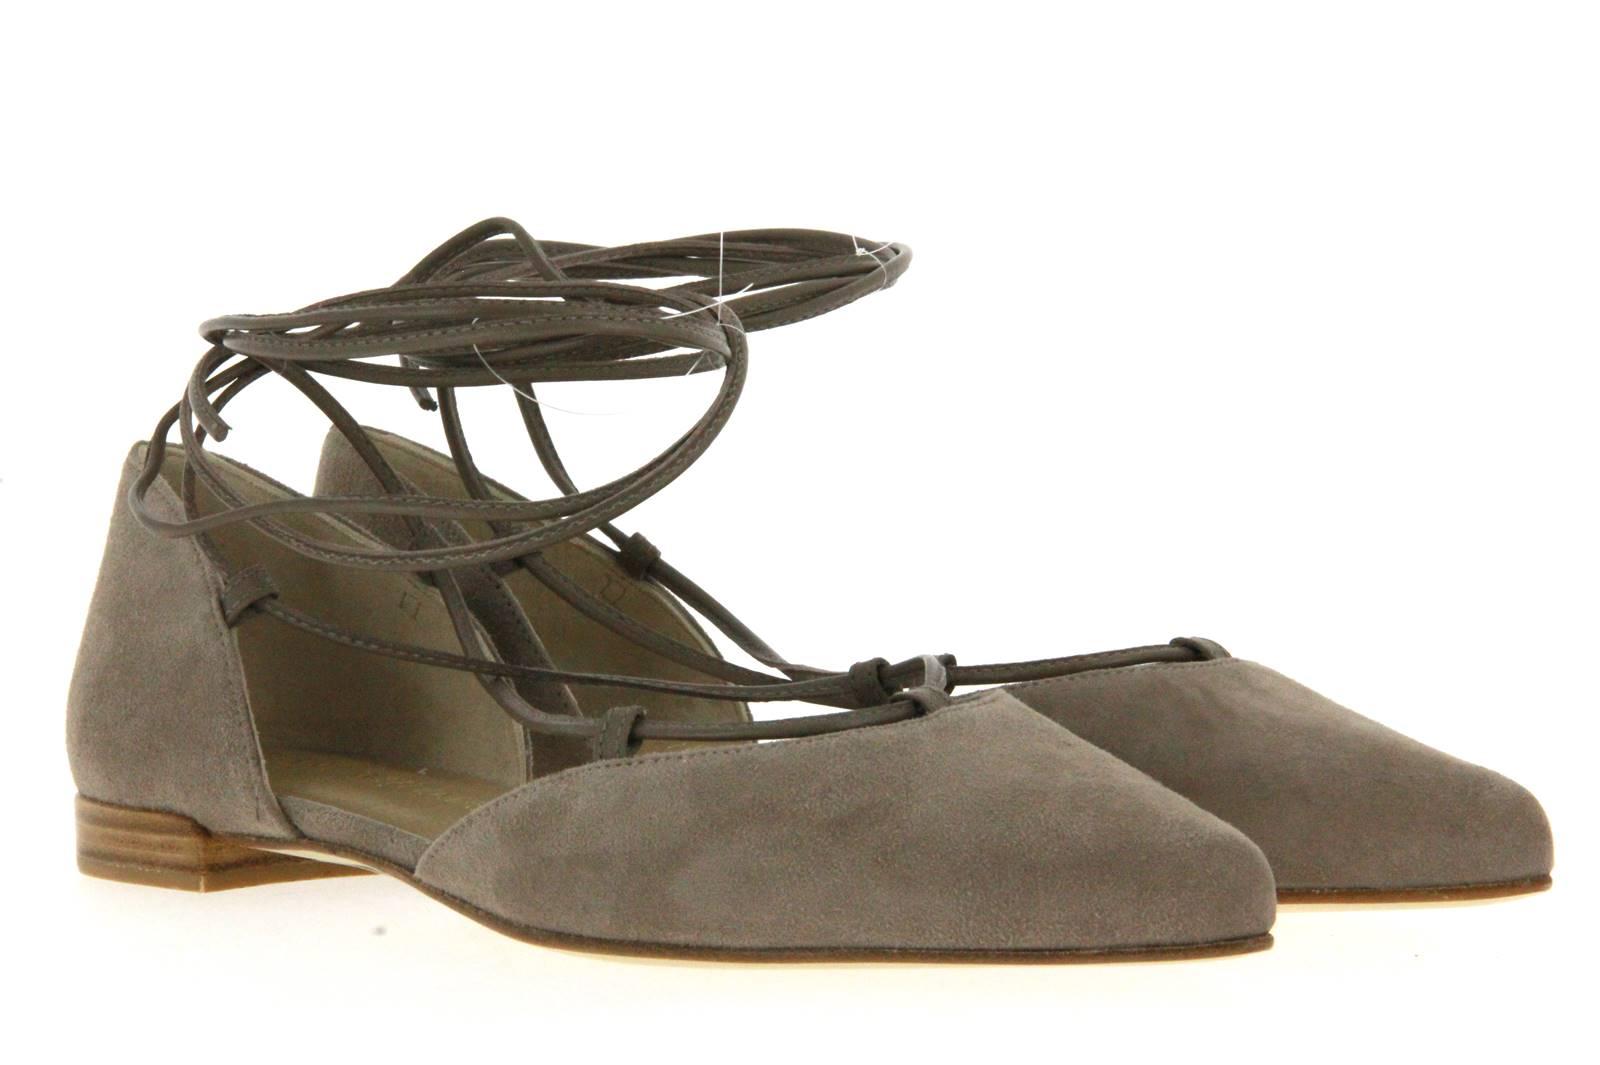 Stuart Weitzman sandal GILLIGAN HAZE SUEDE